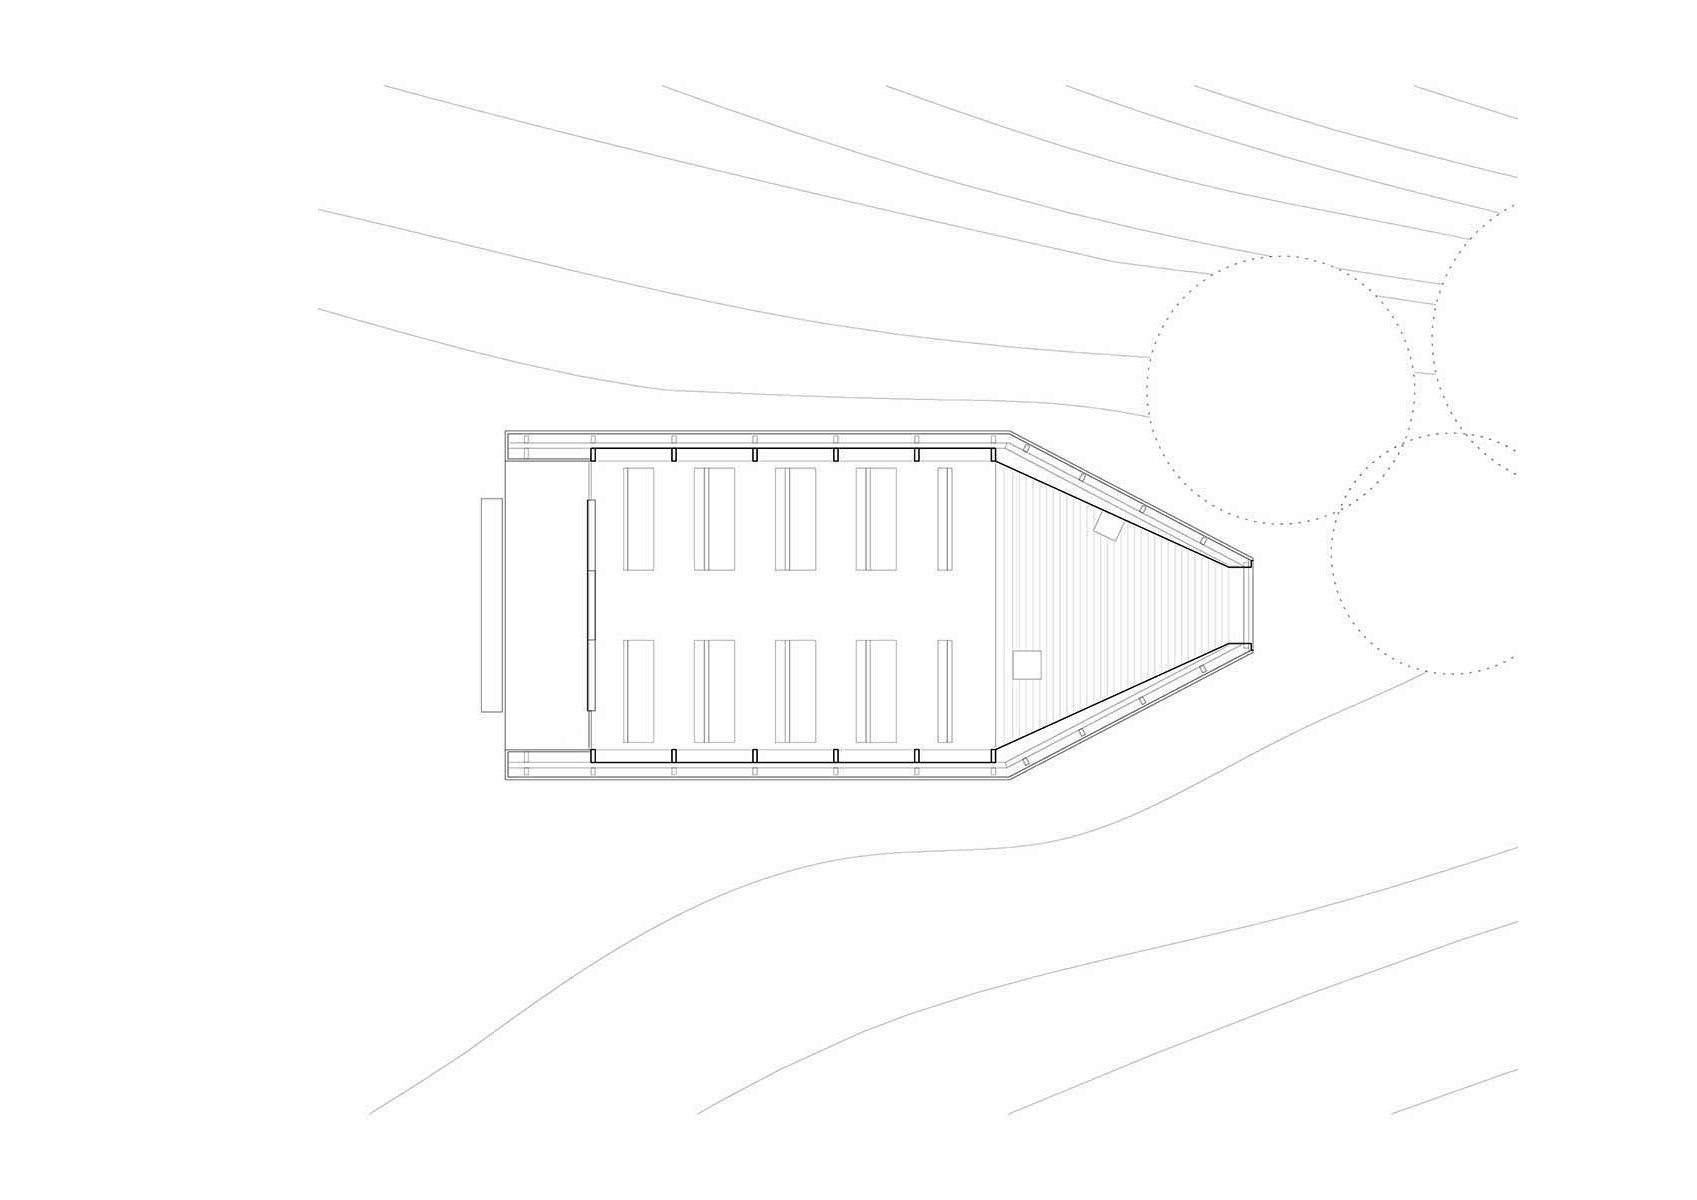 Floor Plan of Salgenreute Chapel by Bernardo Barder Architects